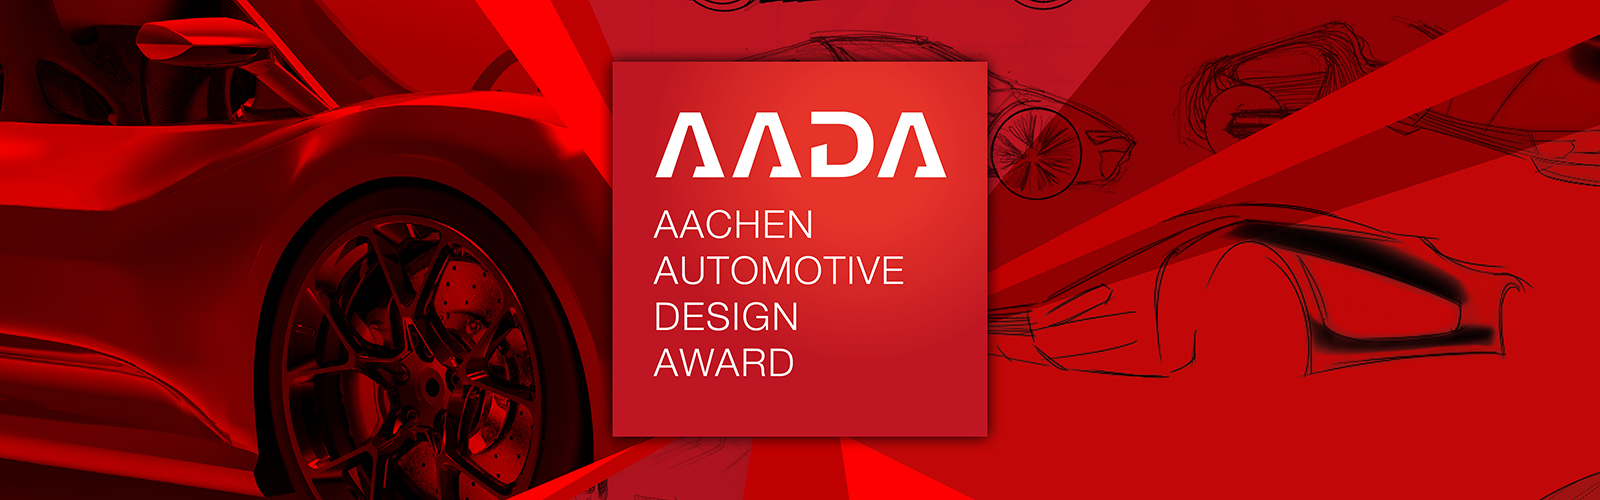 Braunwagner Design Consulting und Services AADA Award 2018